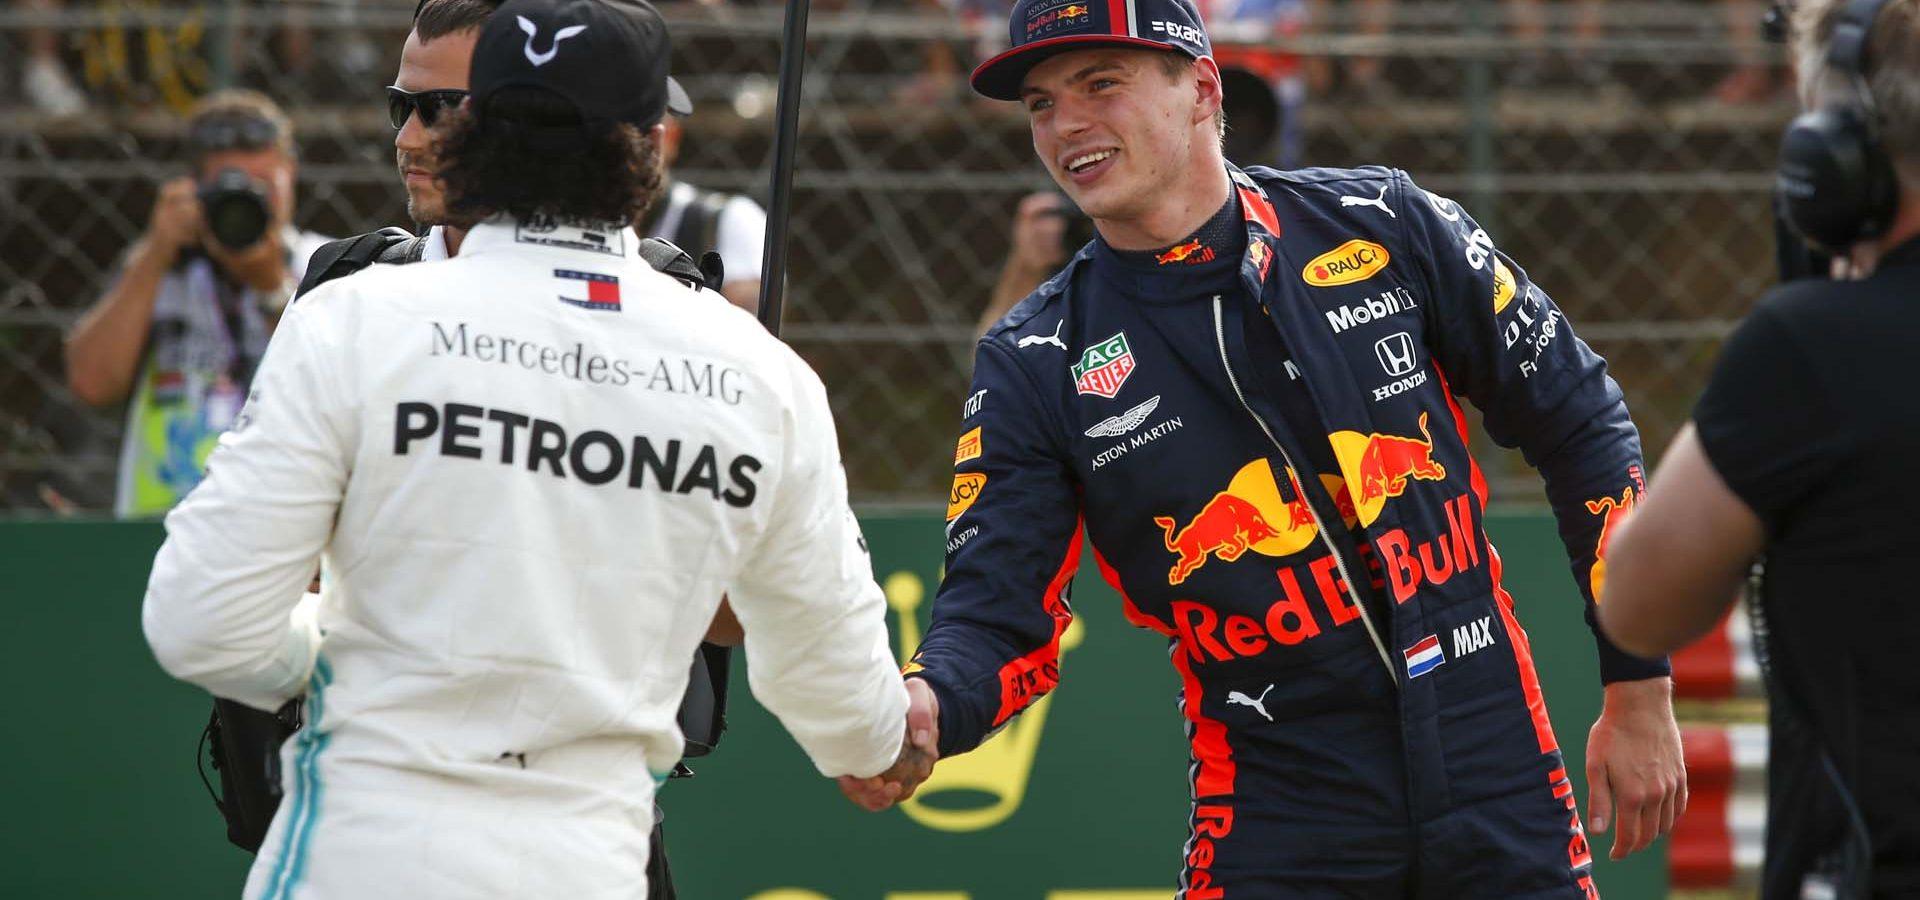 2019 Hungarian Grand Prix, Saturday - Wolfgang Wilhelm Lewis Hamilton Max Verstappen